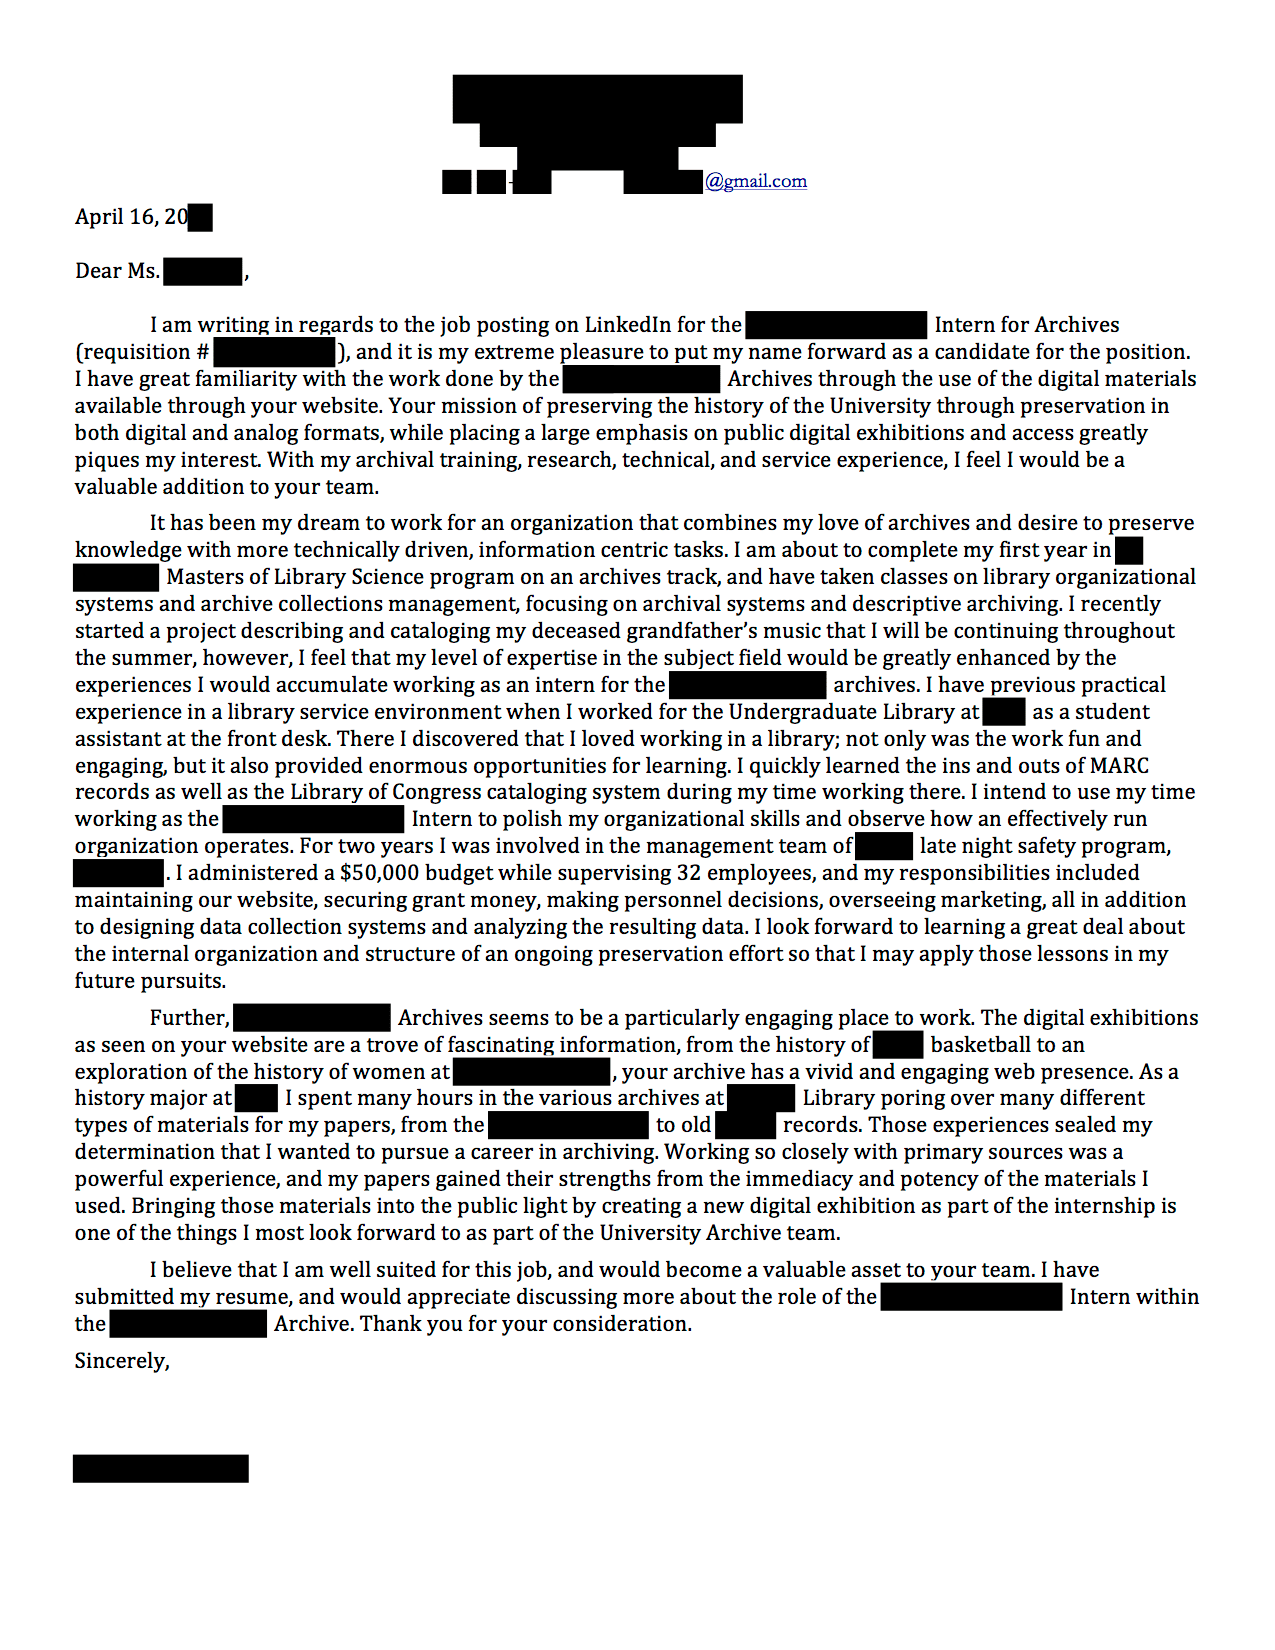 google internship cover letters